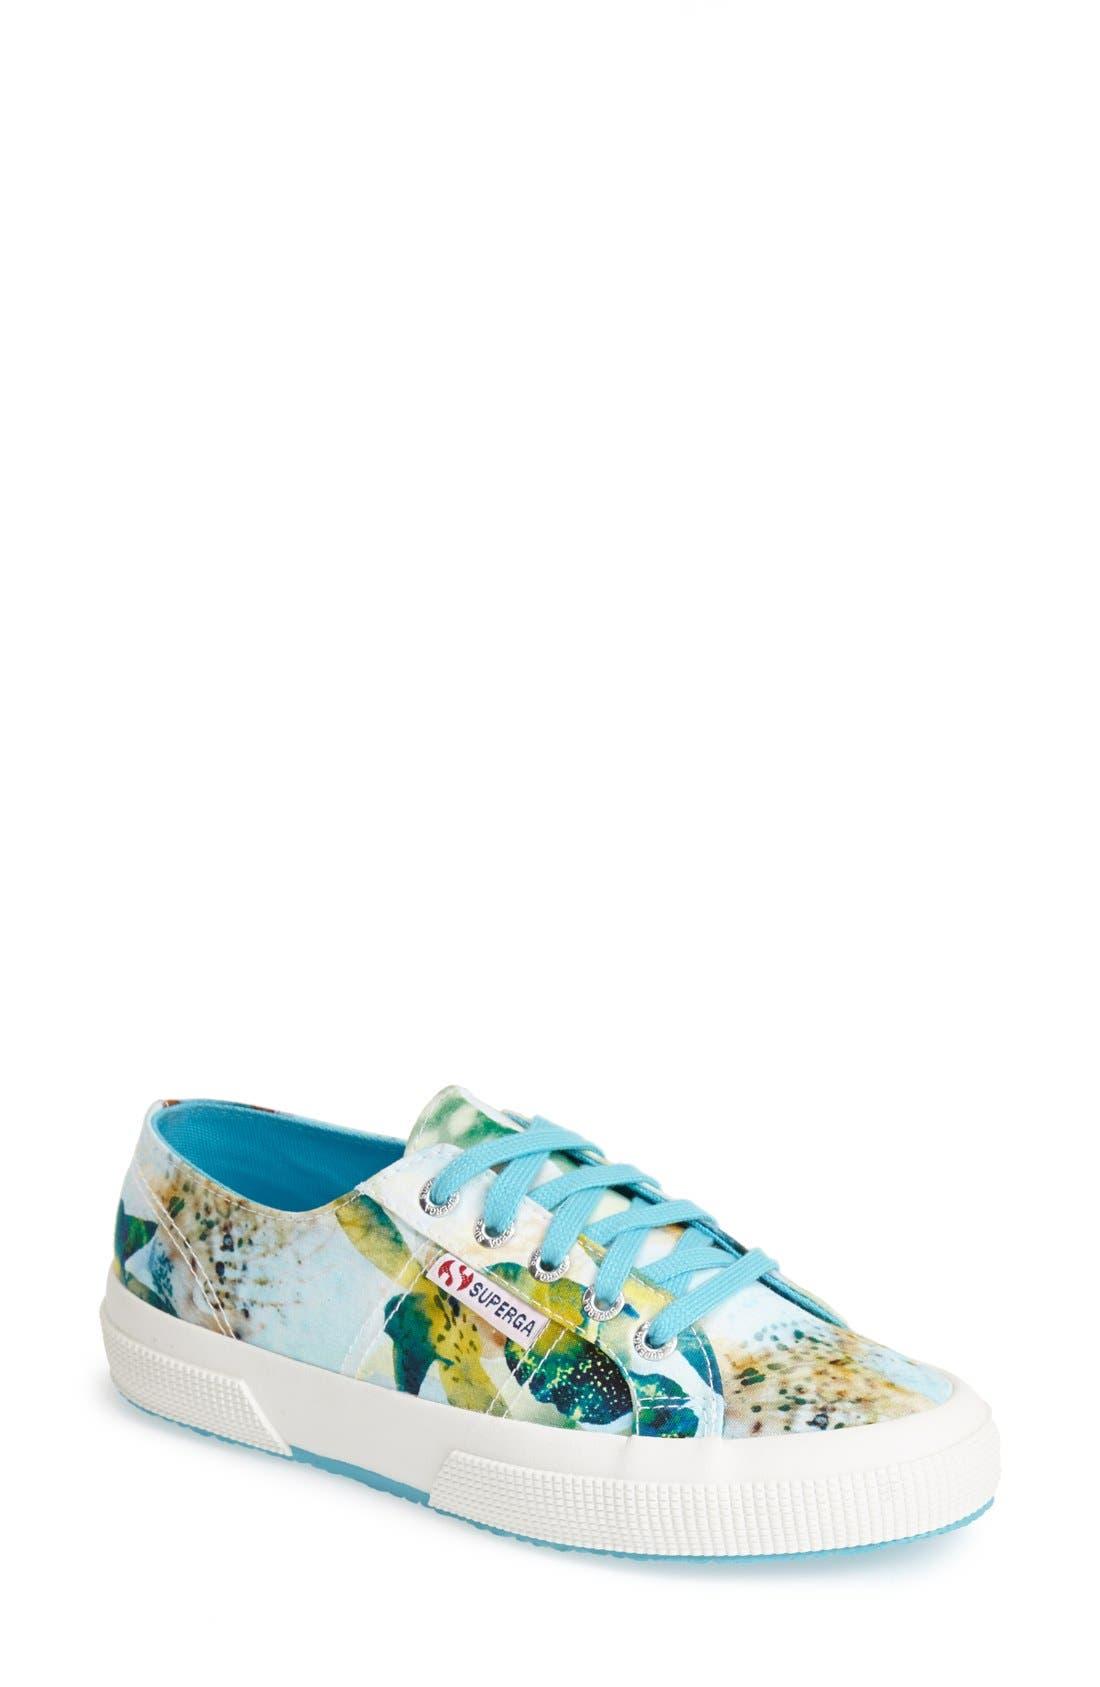 Alternate Image 1 Selected - Superga 'Bahamas' Sneaker (Women)